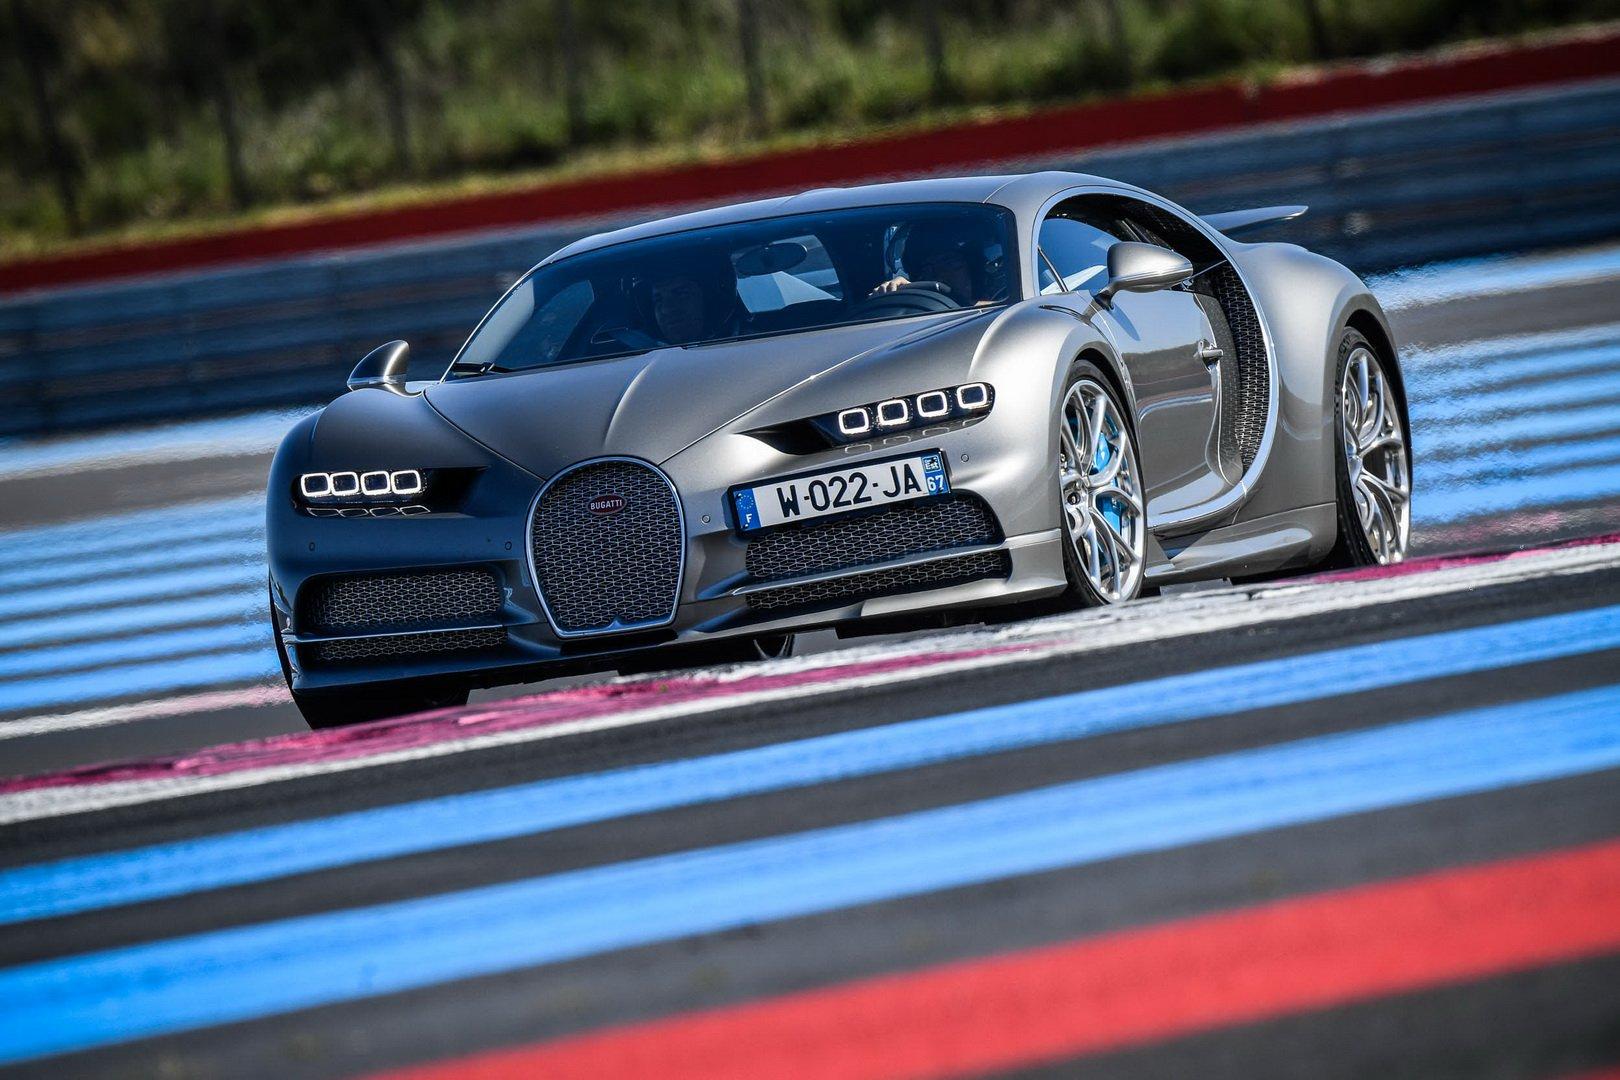 Bugatti-Chiron-and-Chiron-Sport-at-Paul-Ricard-Circuit-5